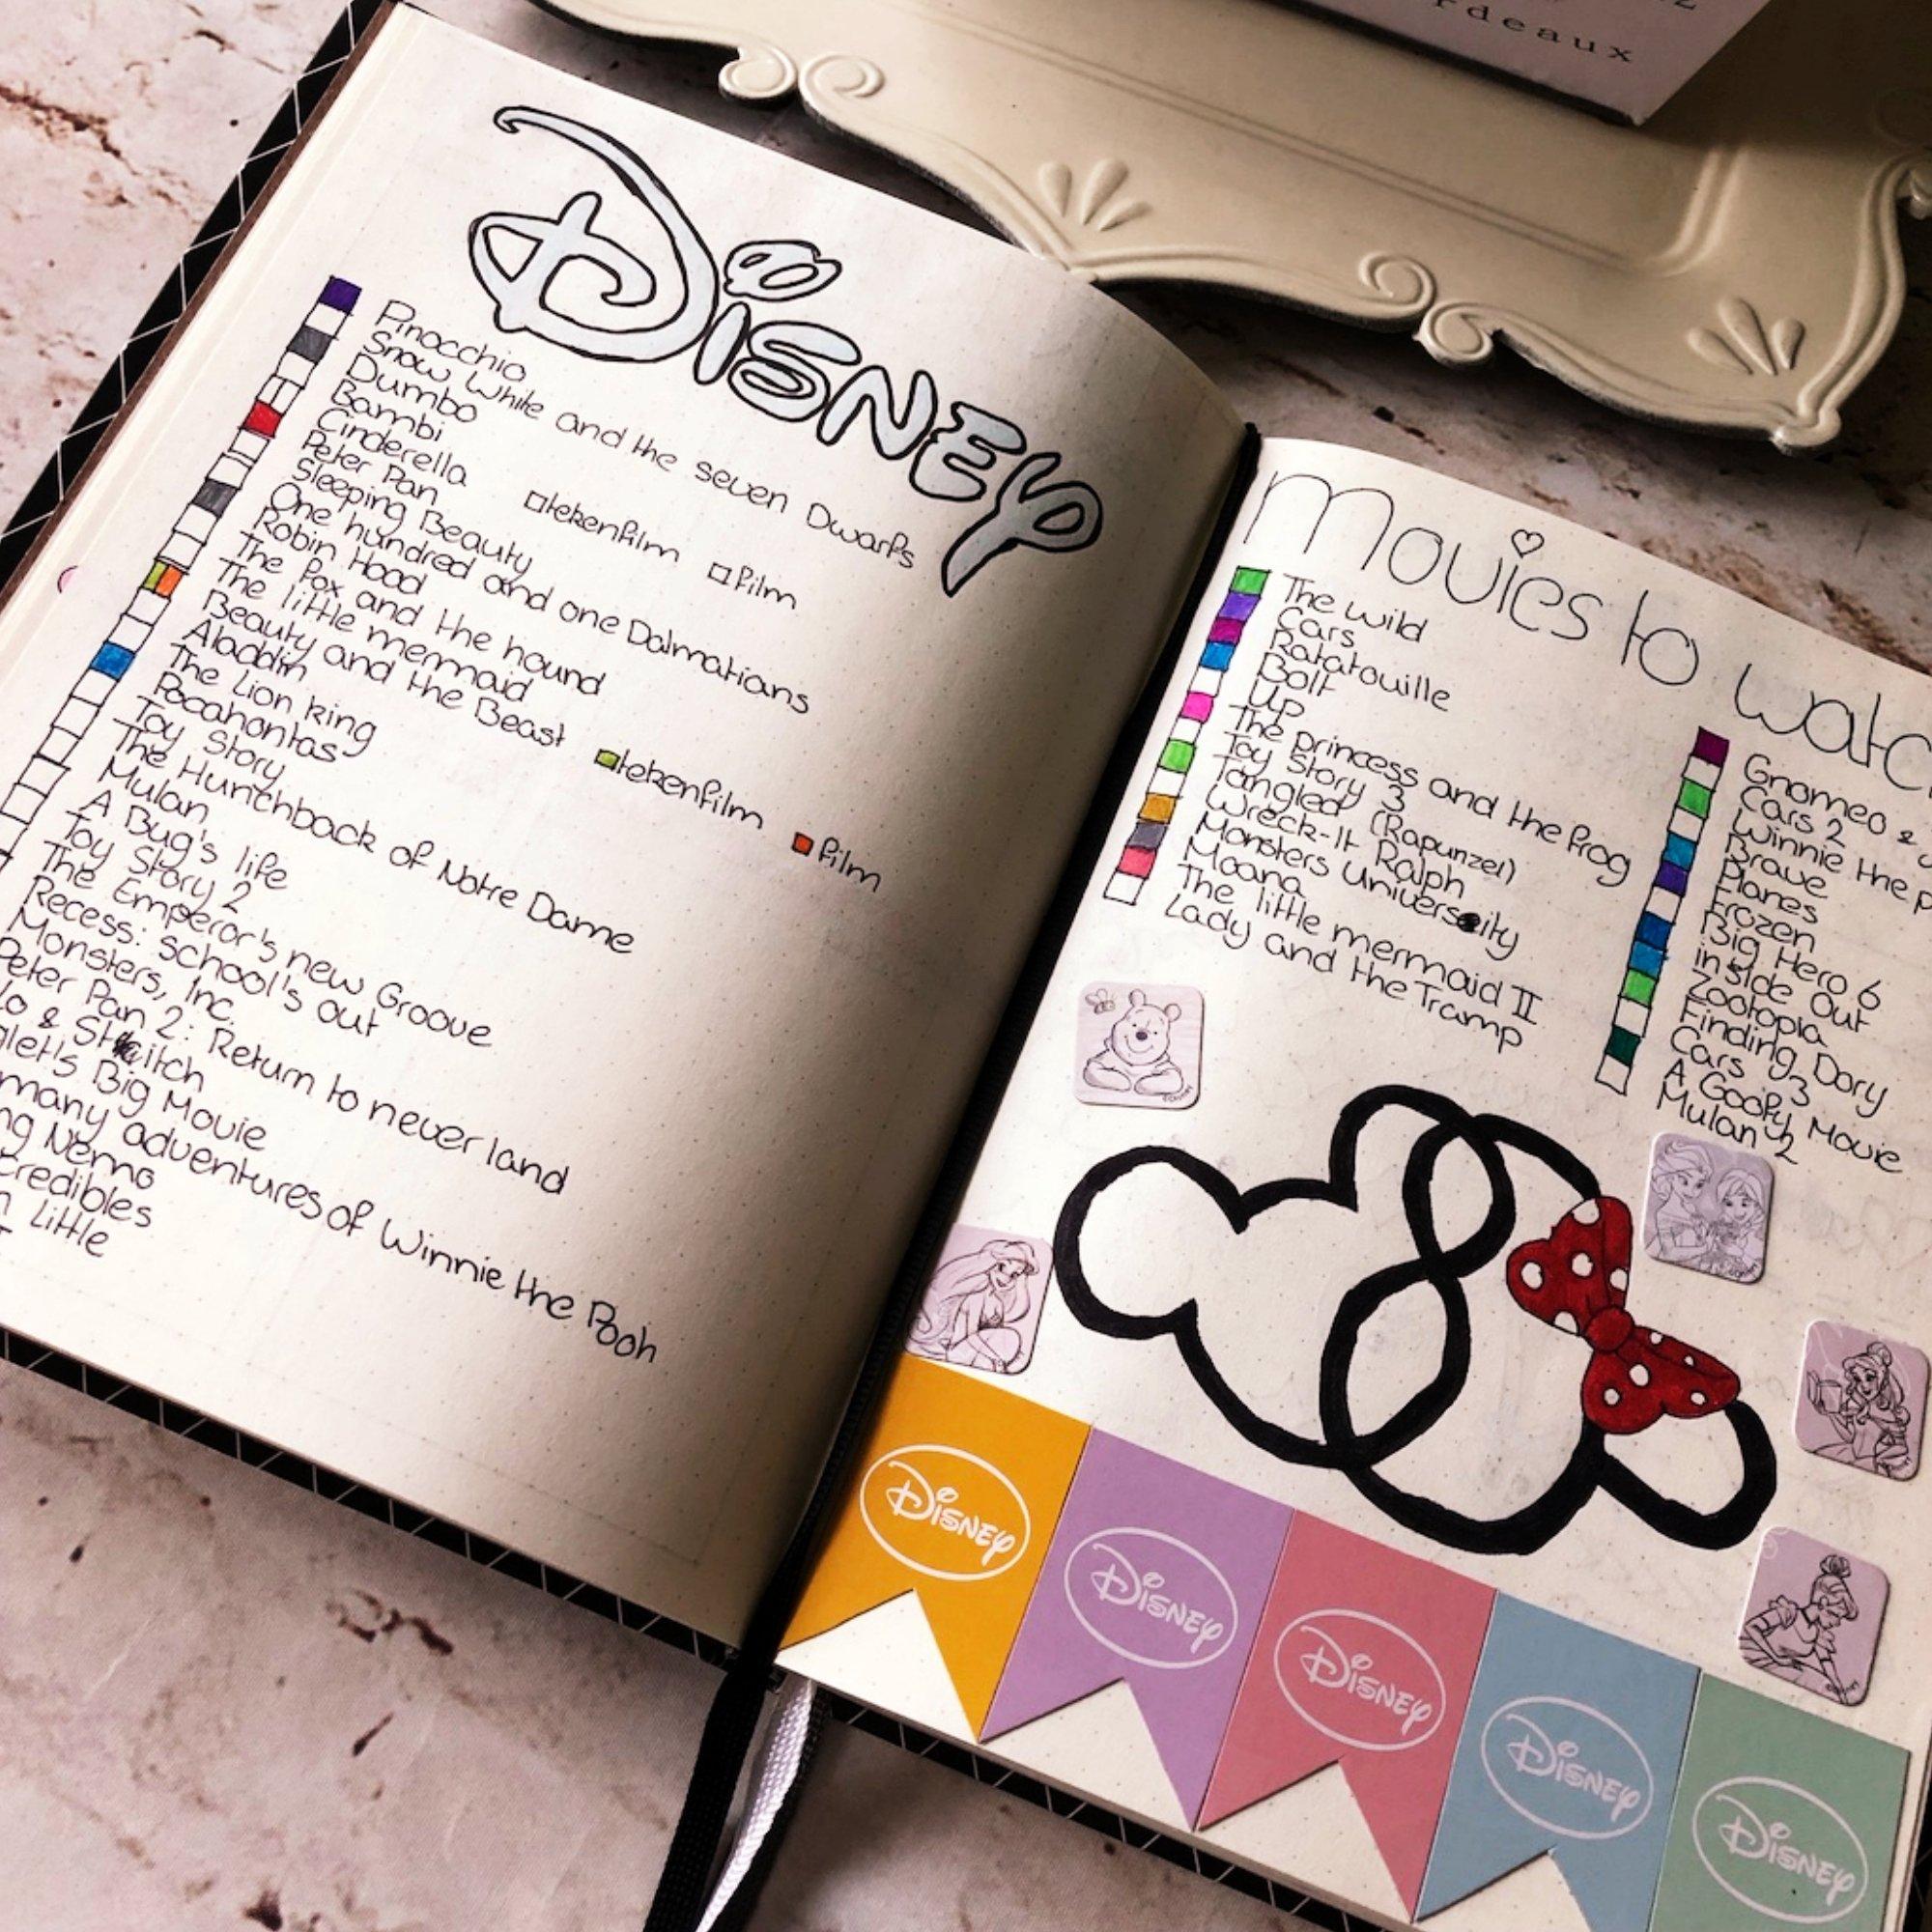 Creative journaling - Disney tracker - itstartswithacoffee.com #creativejournaling #journaling #planner #planning #disney #tracker #disneytracker